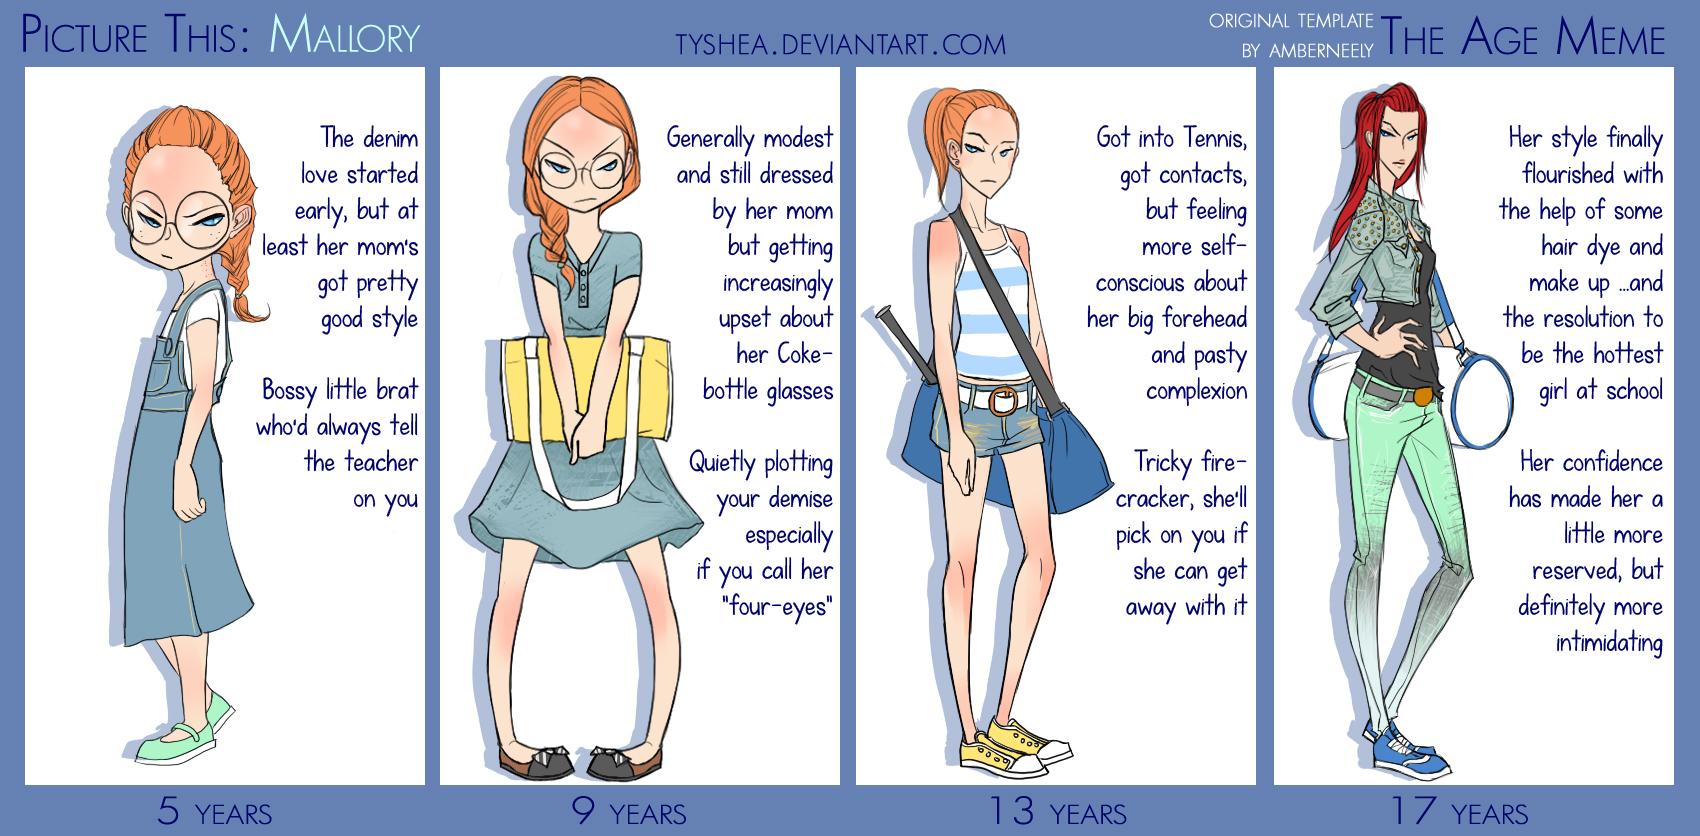 PT - Mal Age Meme by Tyshea